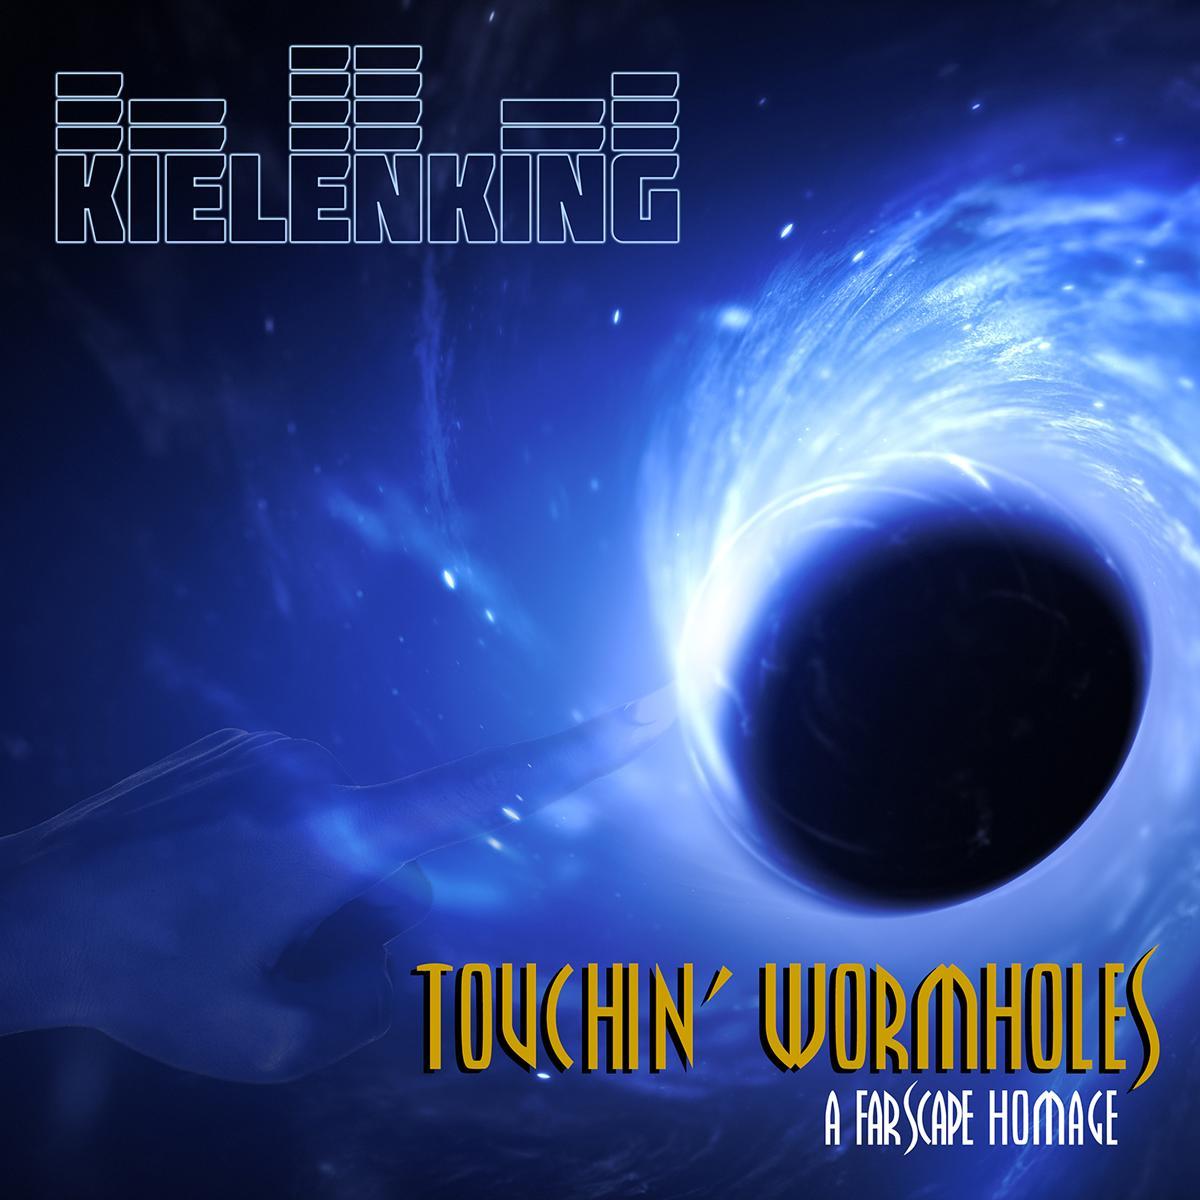 KielenKingMusic - Kielen King 🎼 Twitter Profile | Twitock